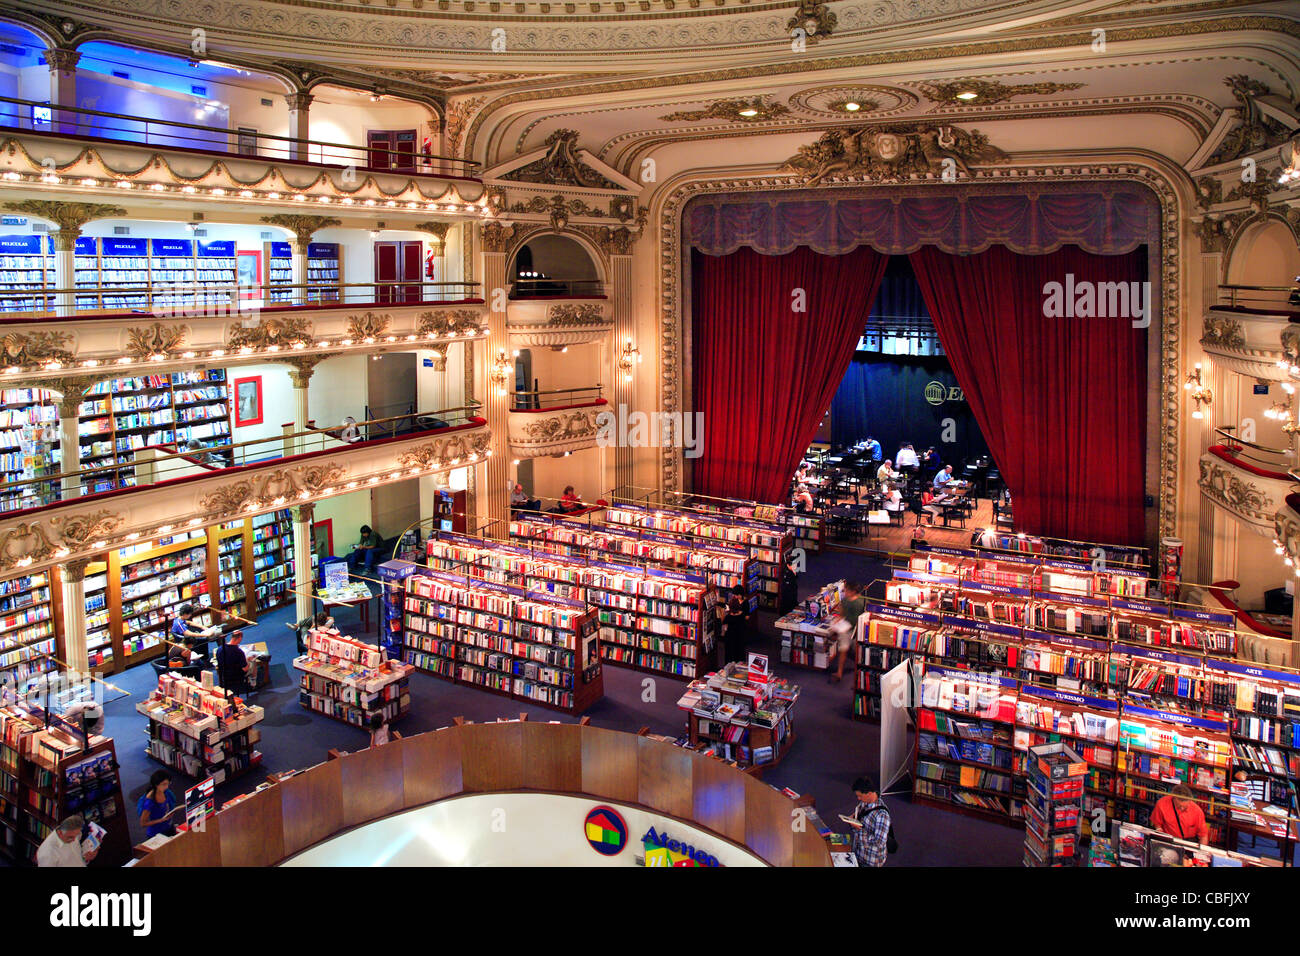 Grand Splendid Ateneo Bookstore. Buenos Aires, Argentina. - Stock Image